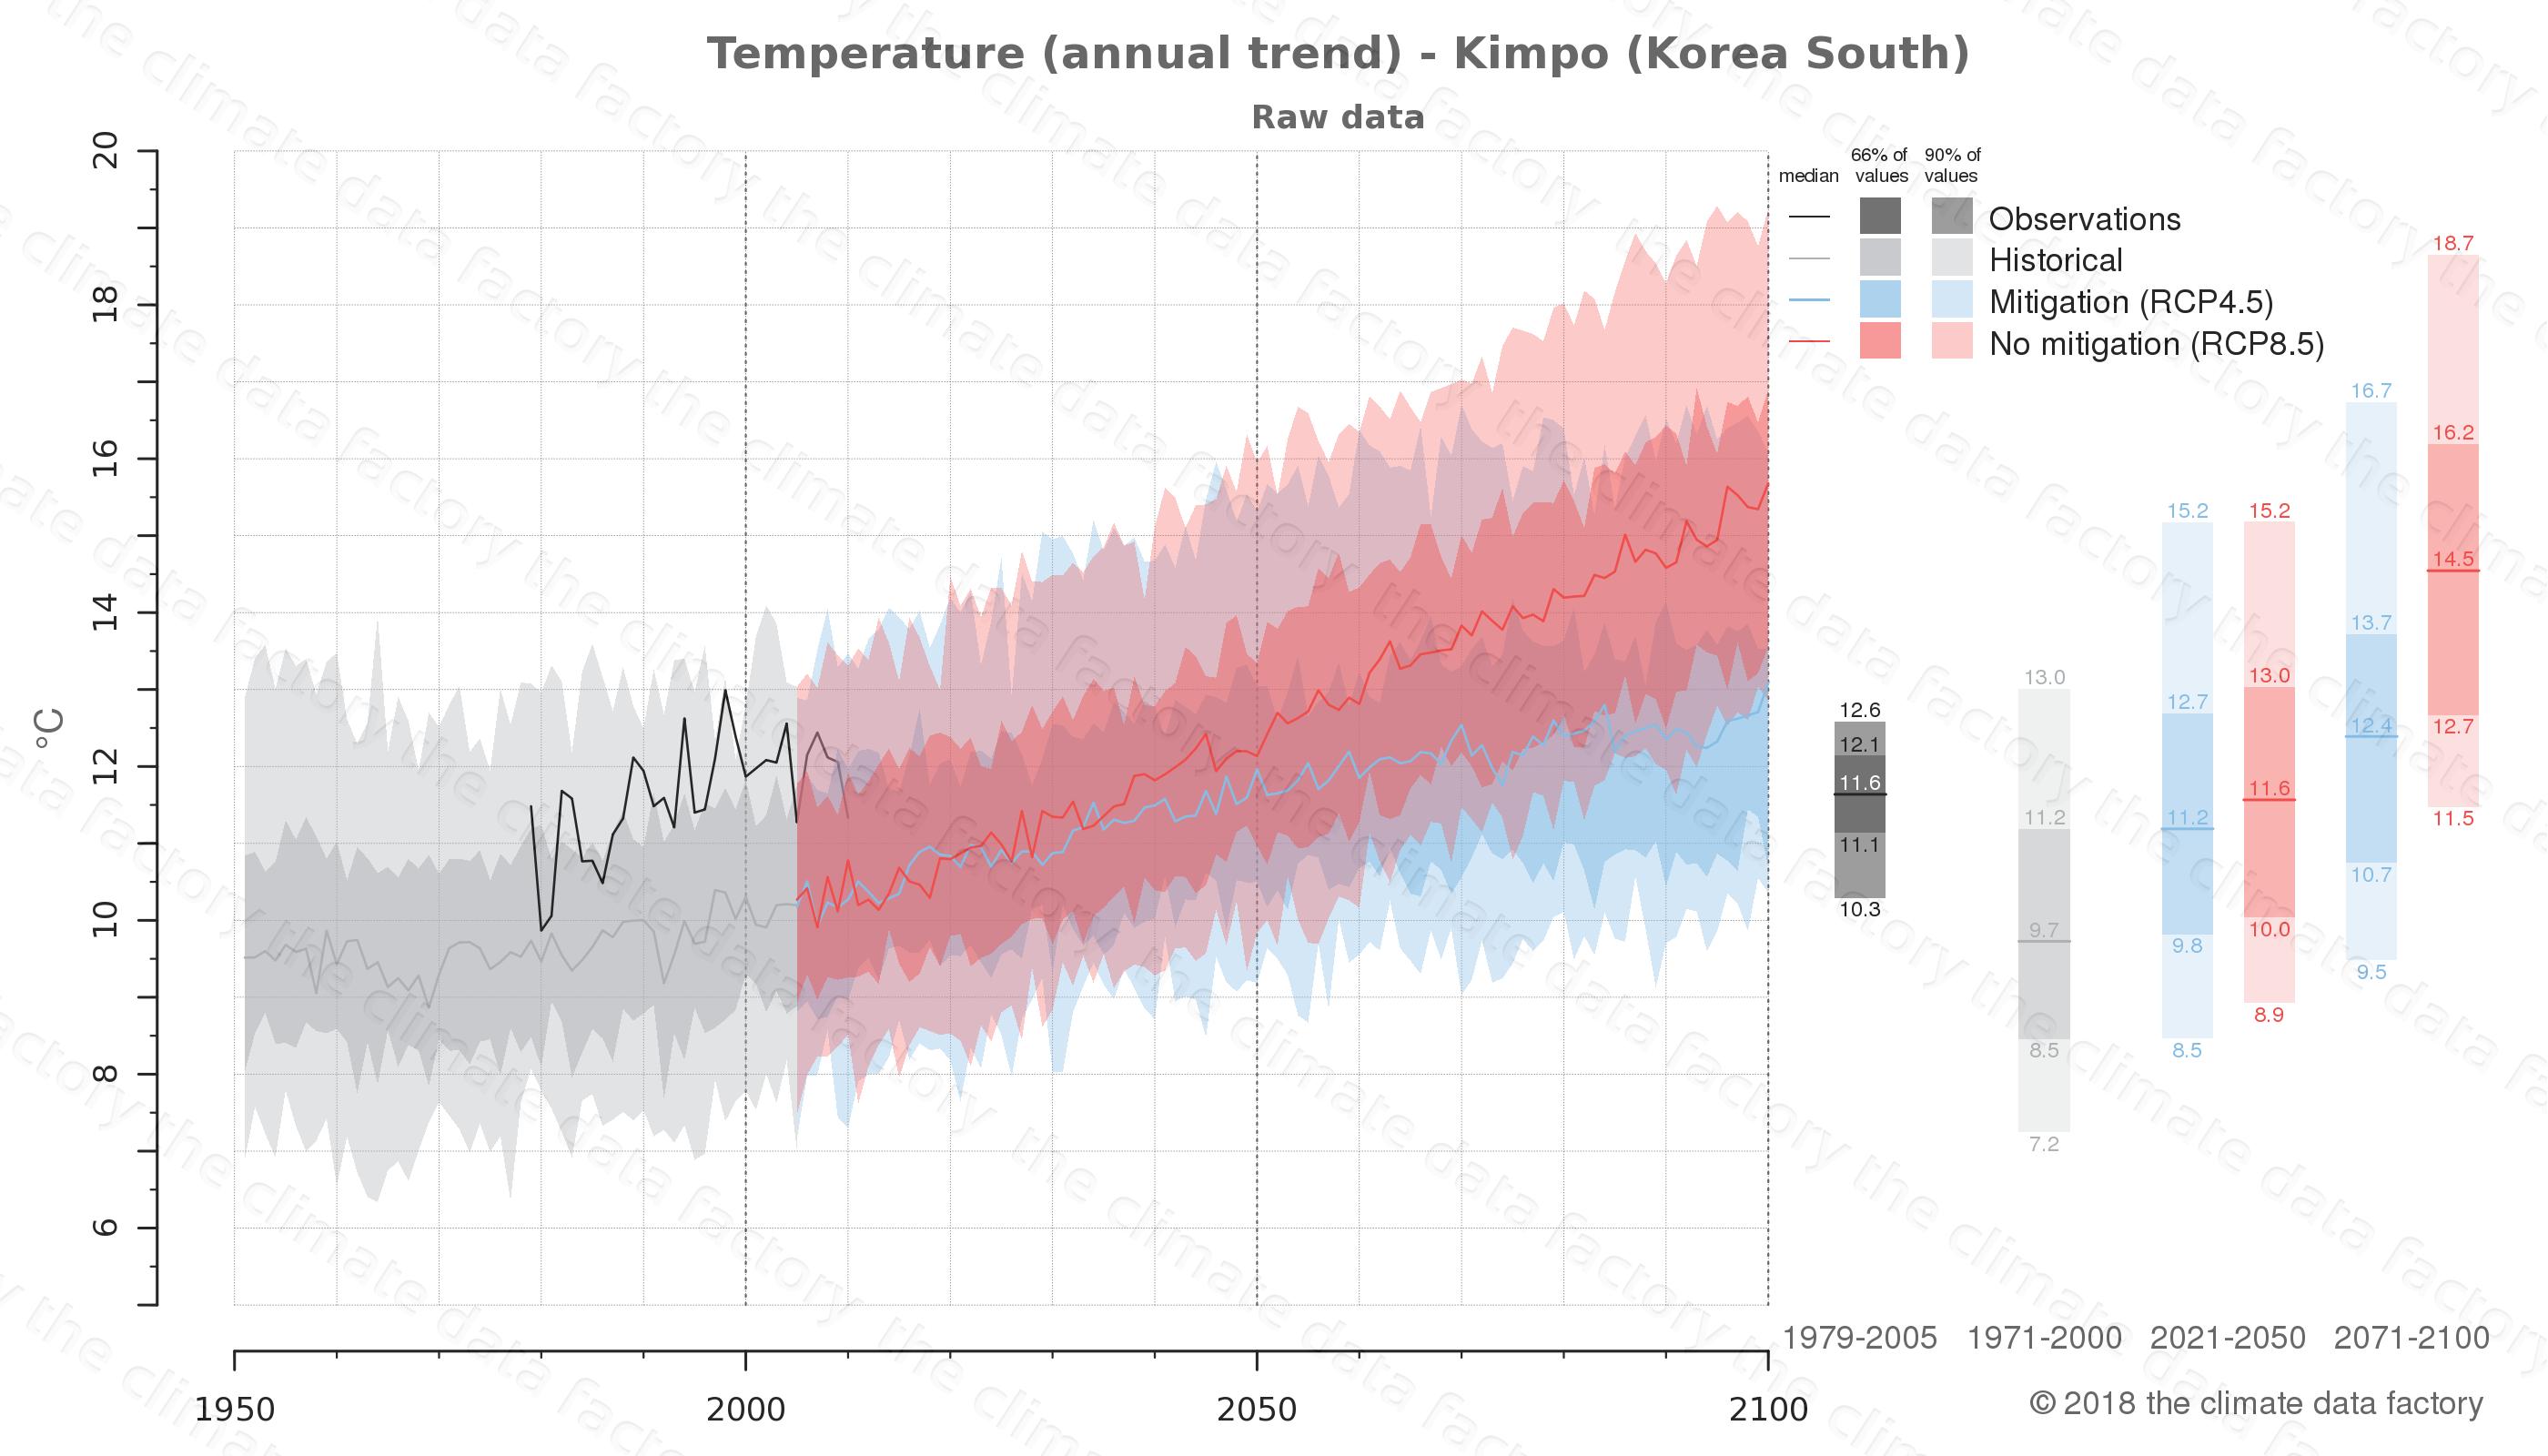 climate change data policy adaptation climate graph city data temperature kimpo south korea